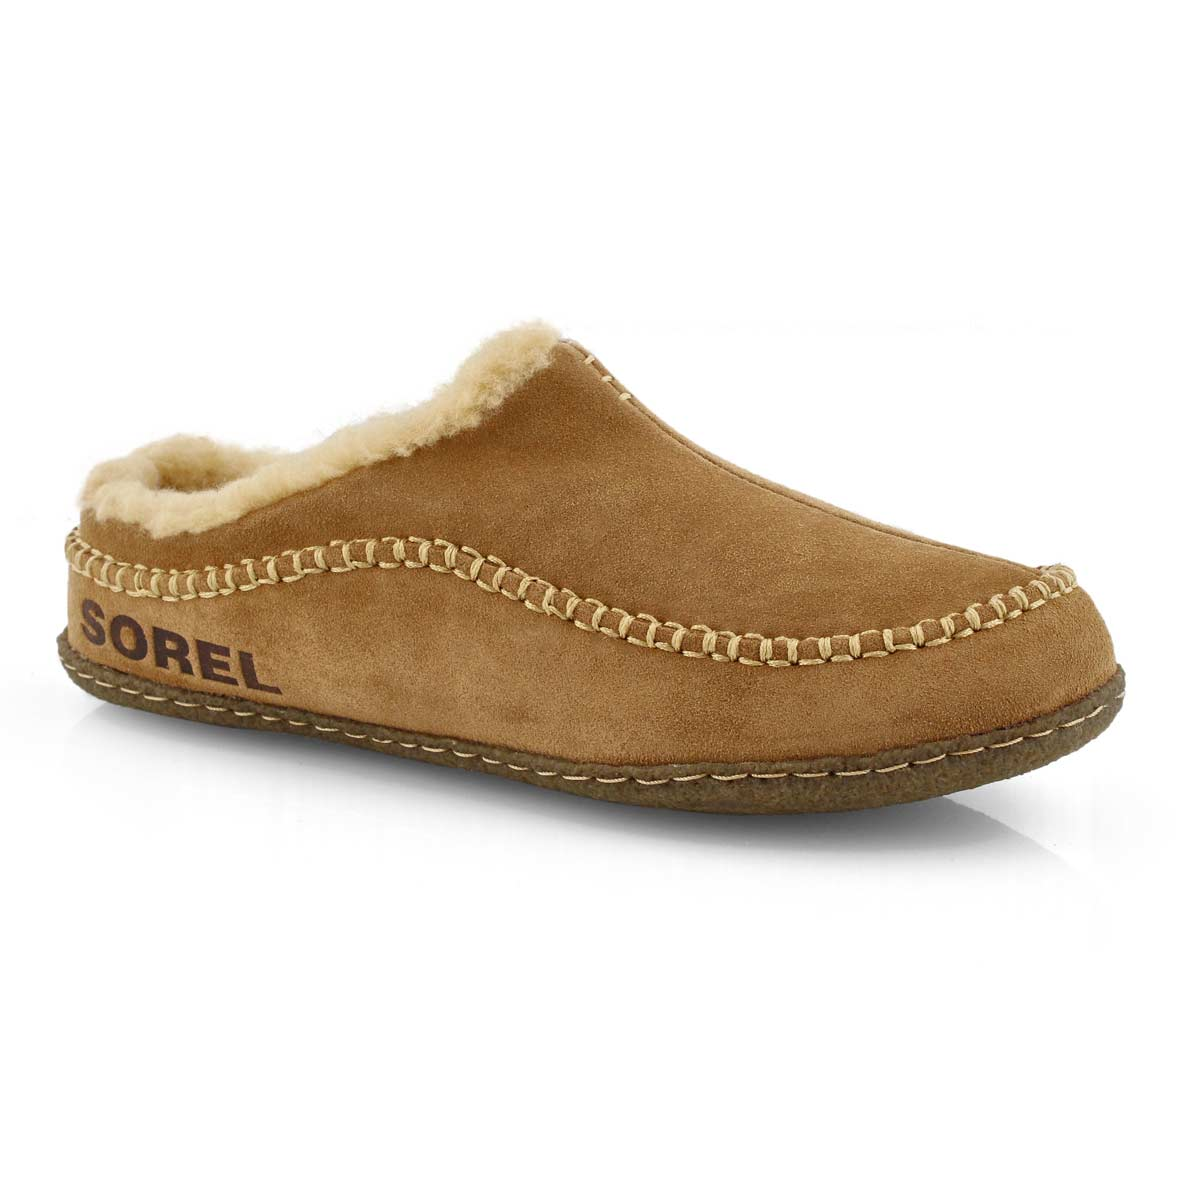 Mns Falcon Ridge II cml brn/crry slipper